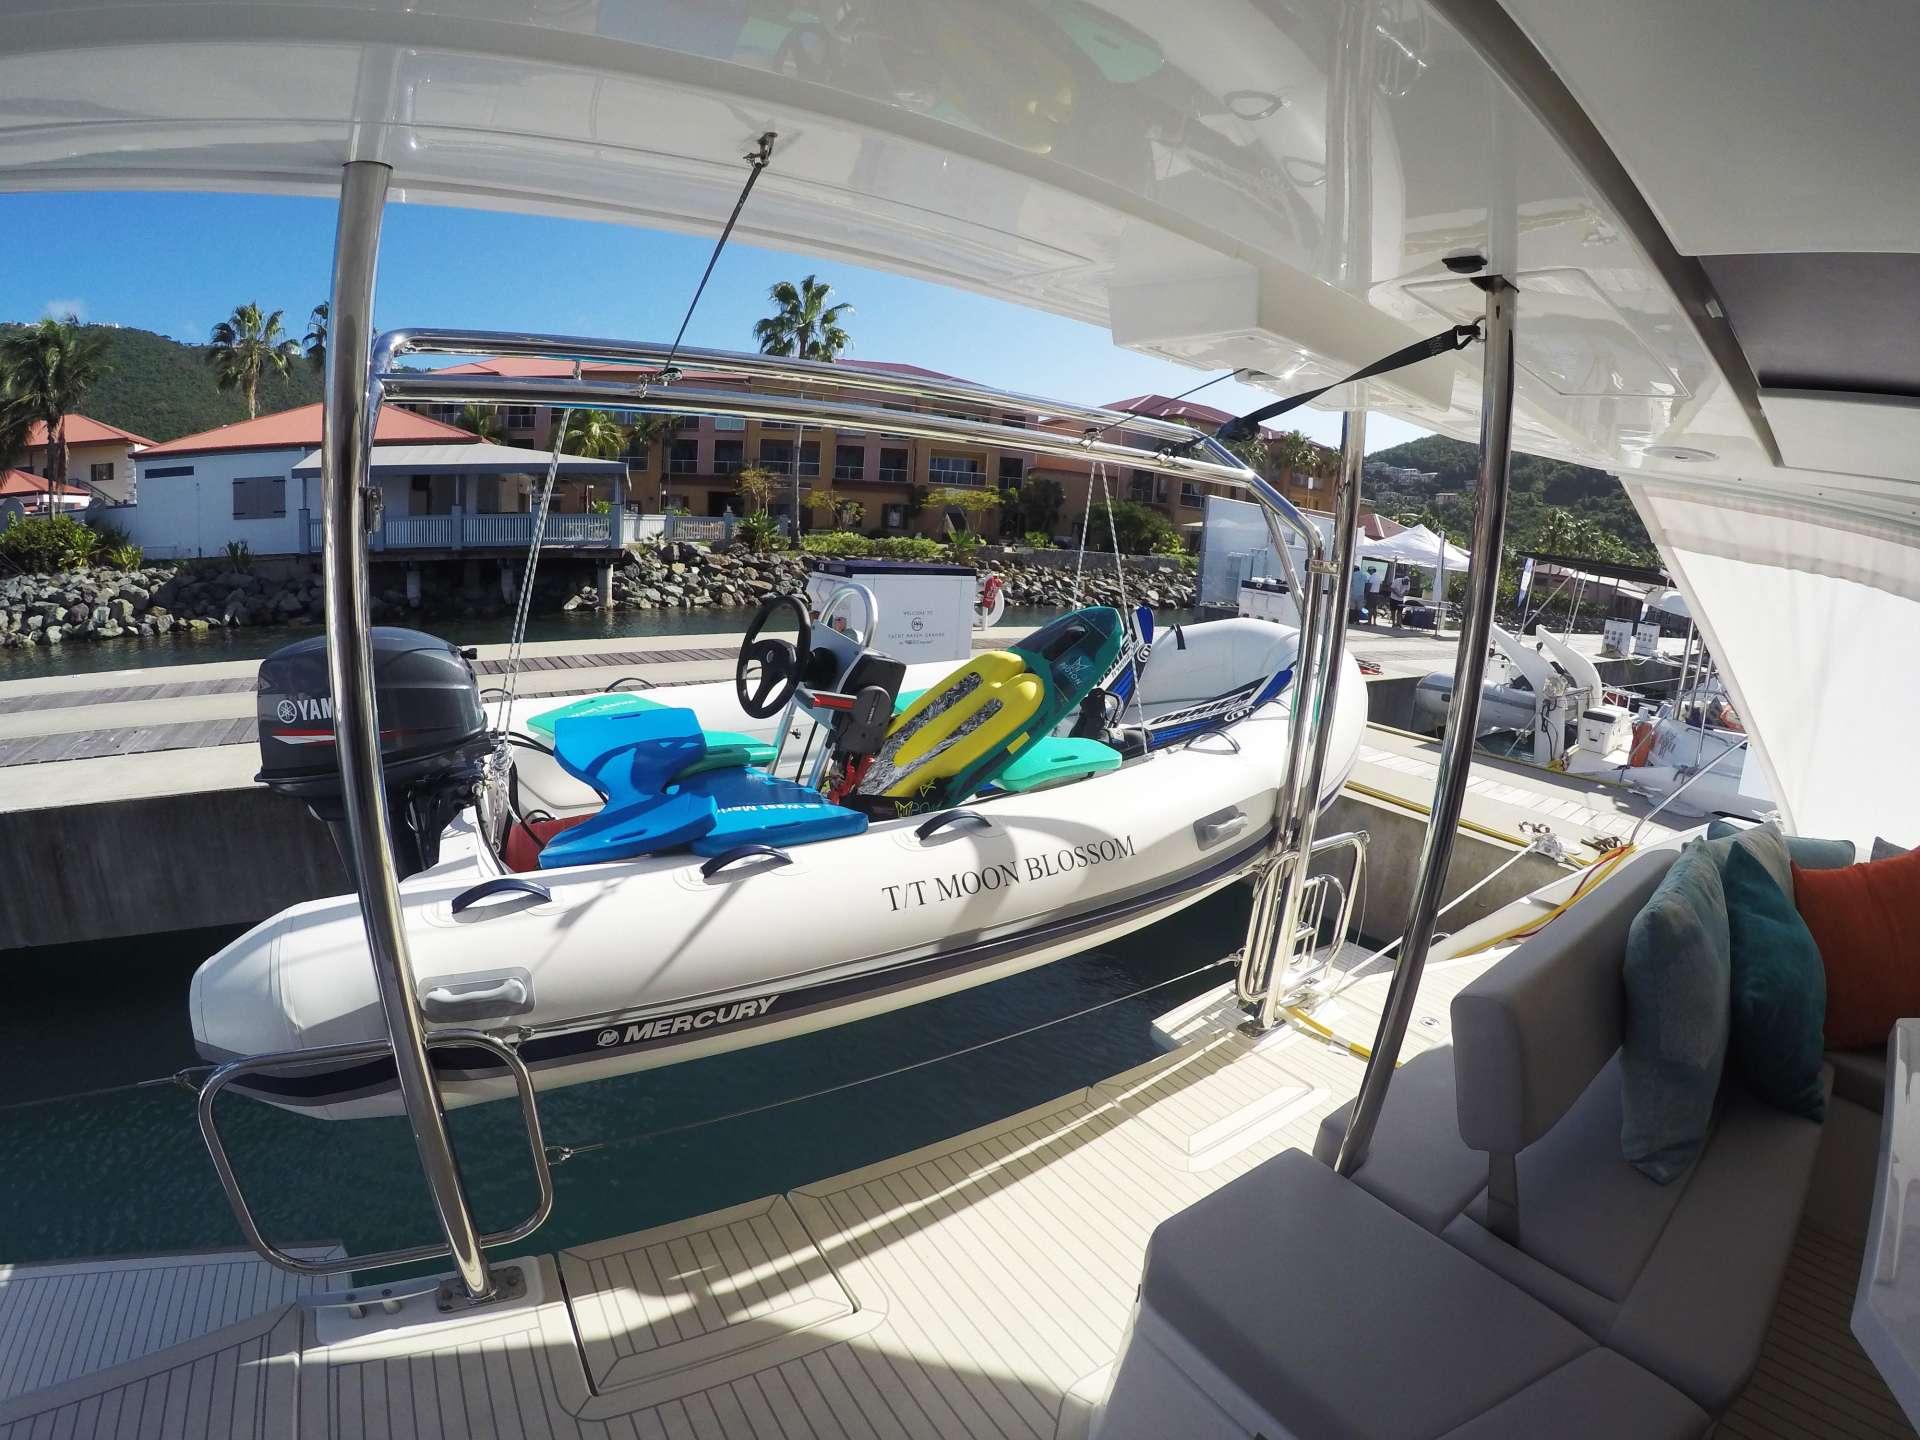 MOON BLOSSOM yacht image # 15